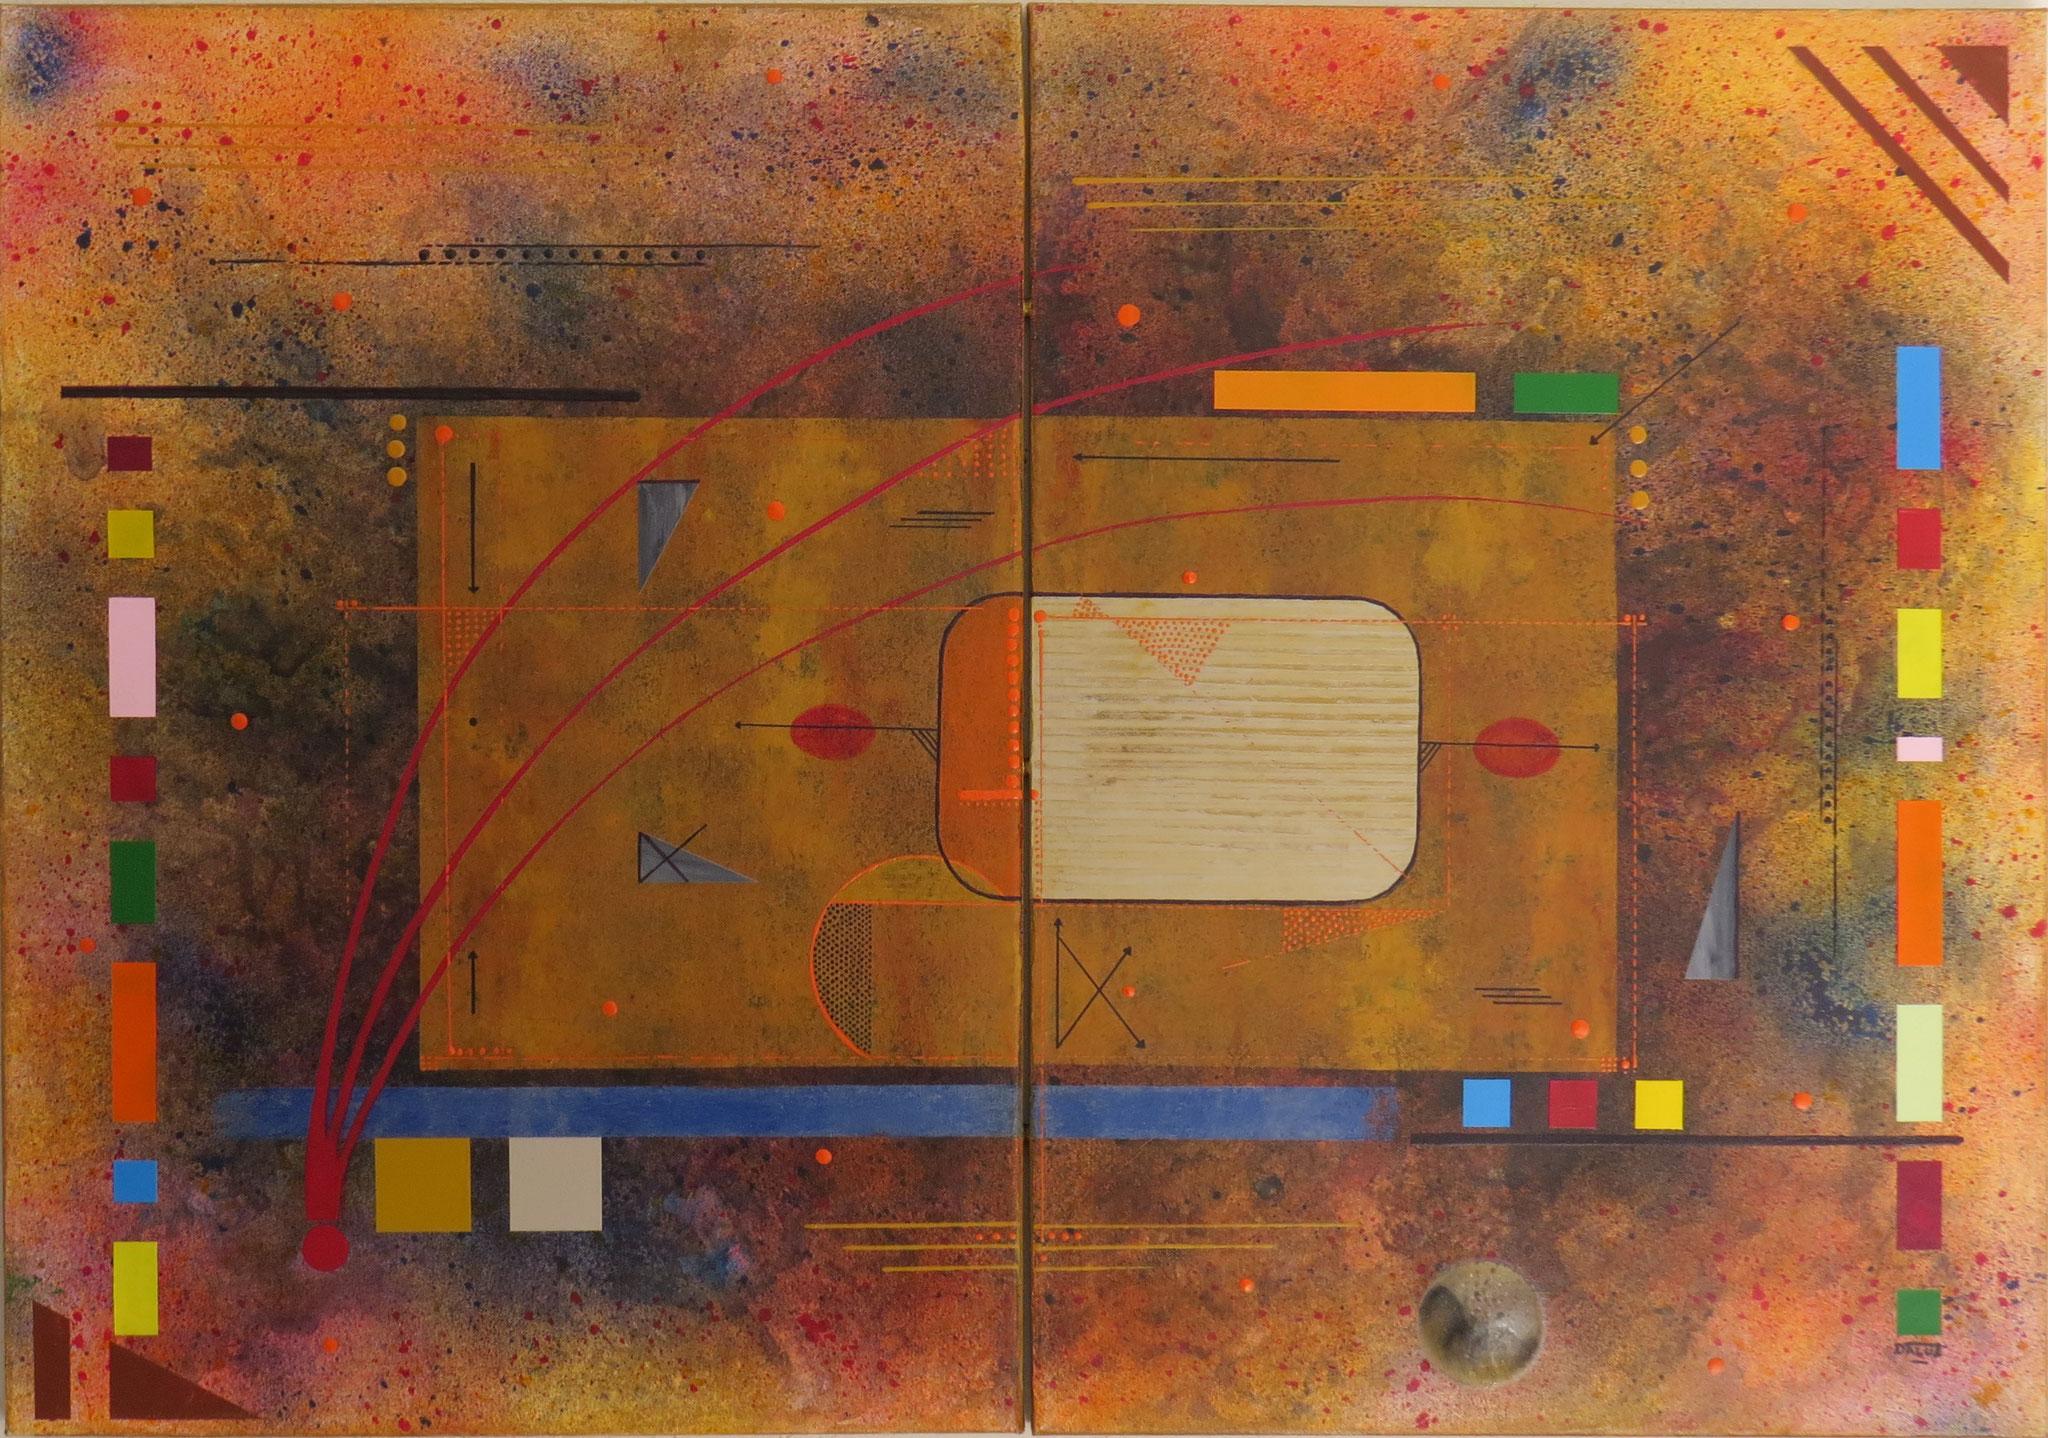 kappa - vue face1 - DALUZ GALEGO - peinture abstraite